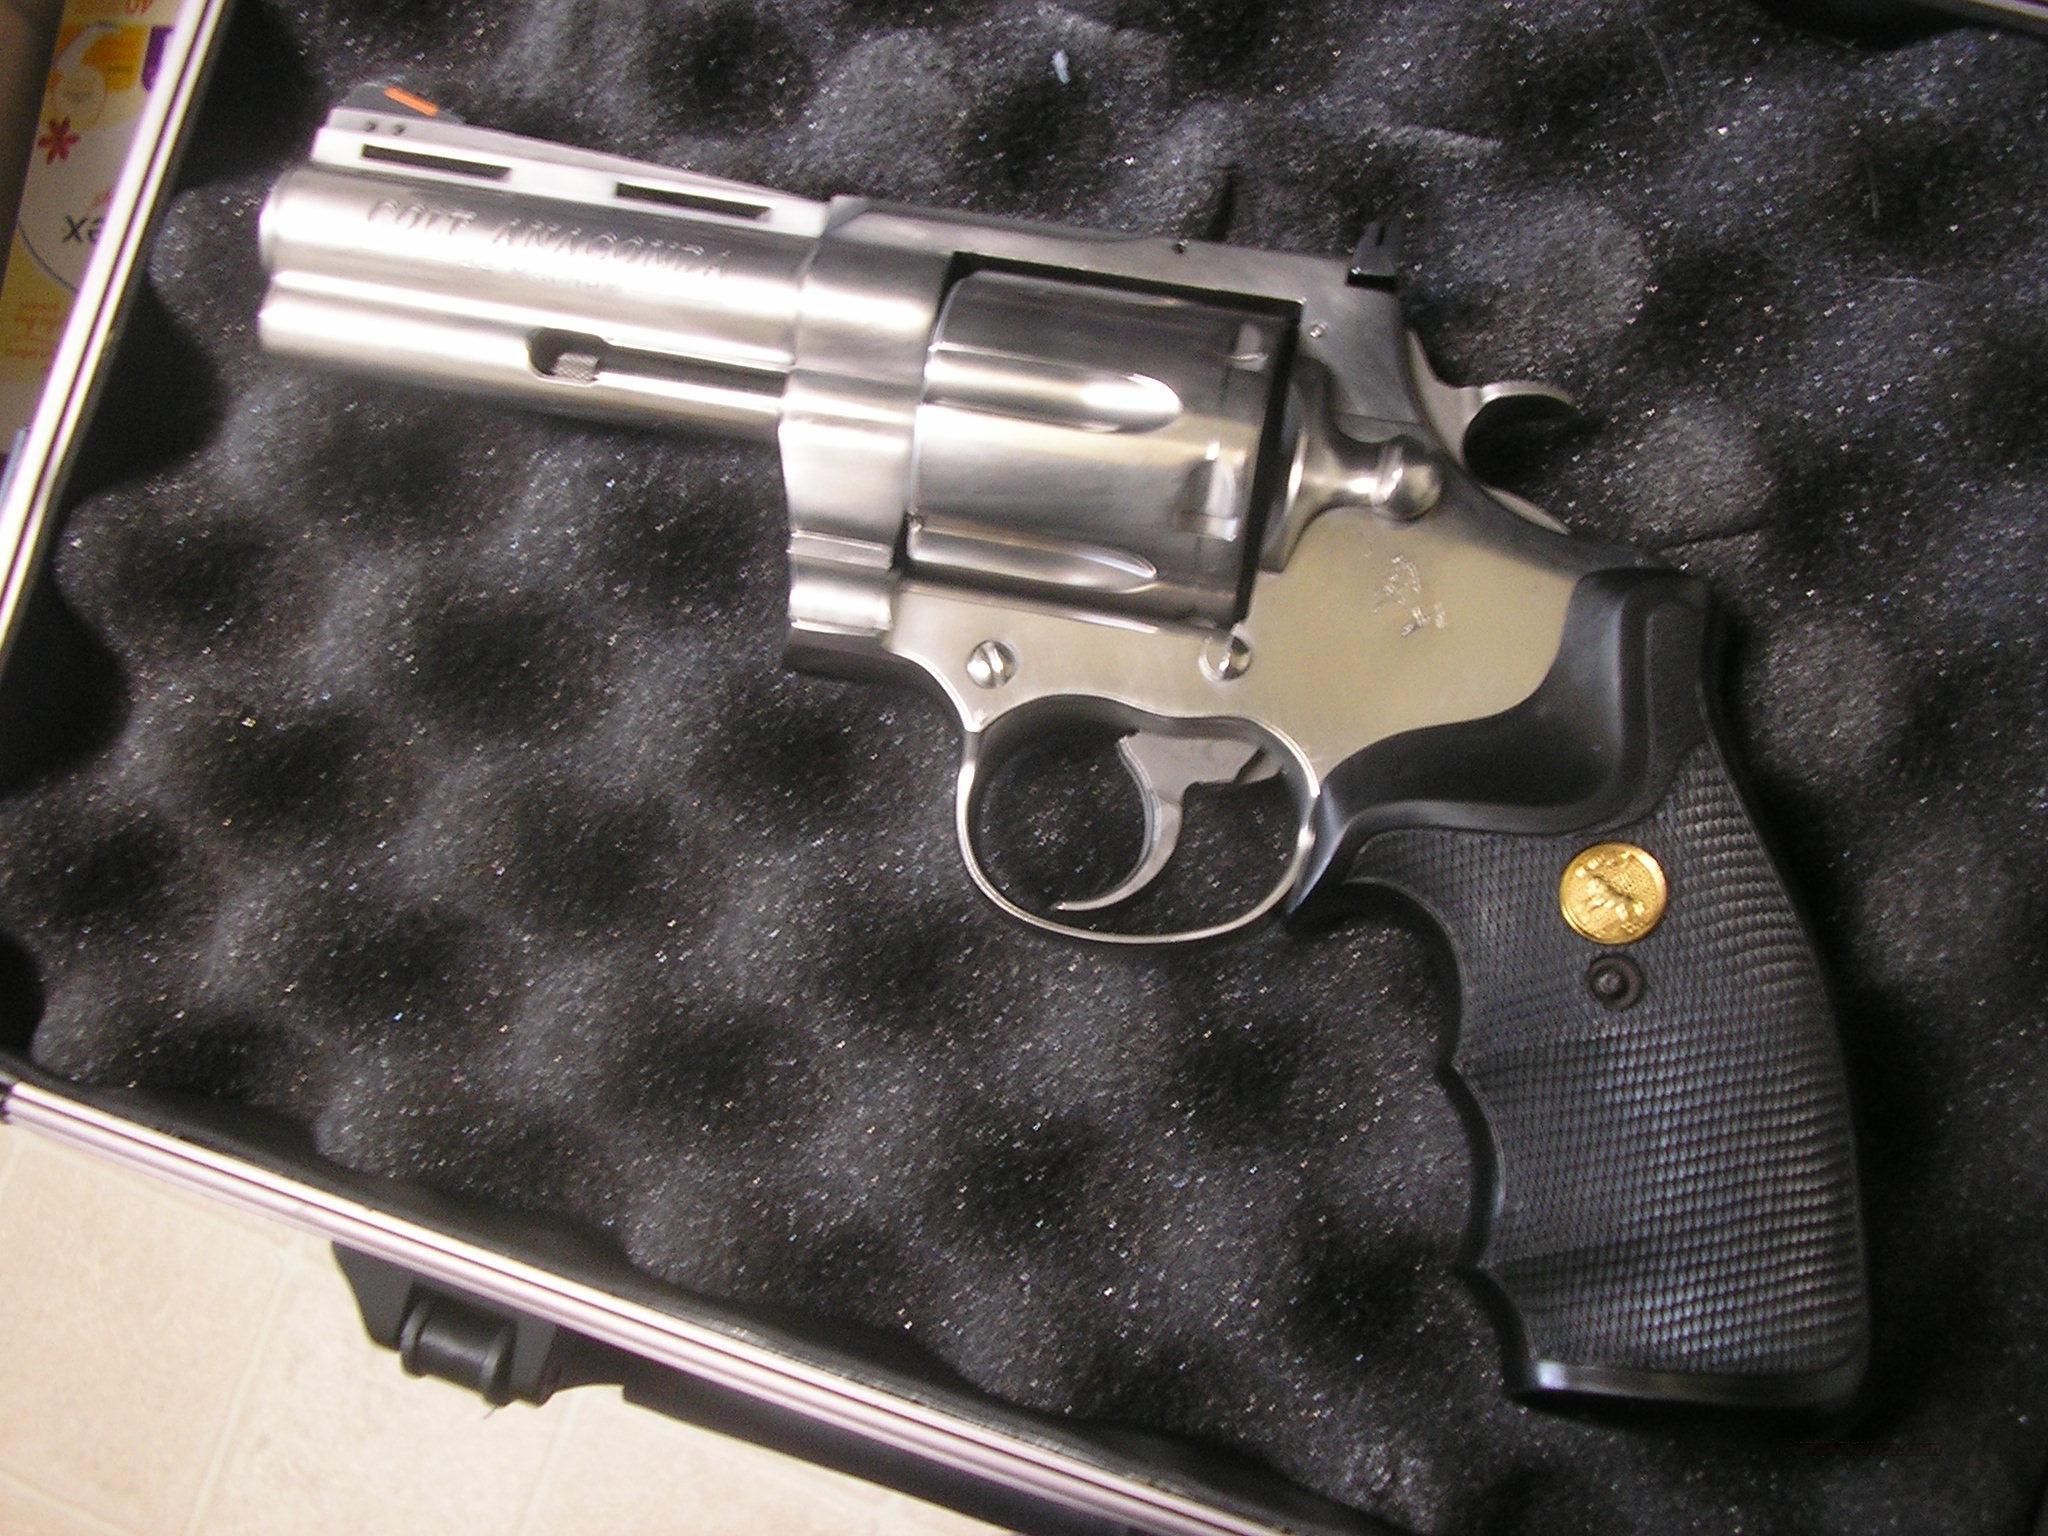 Colt Anaconda, 44 magnum, 4 inch, double action revolver